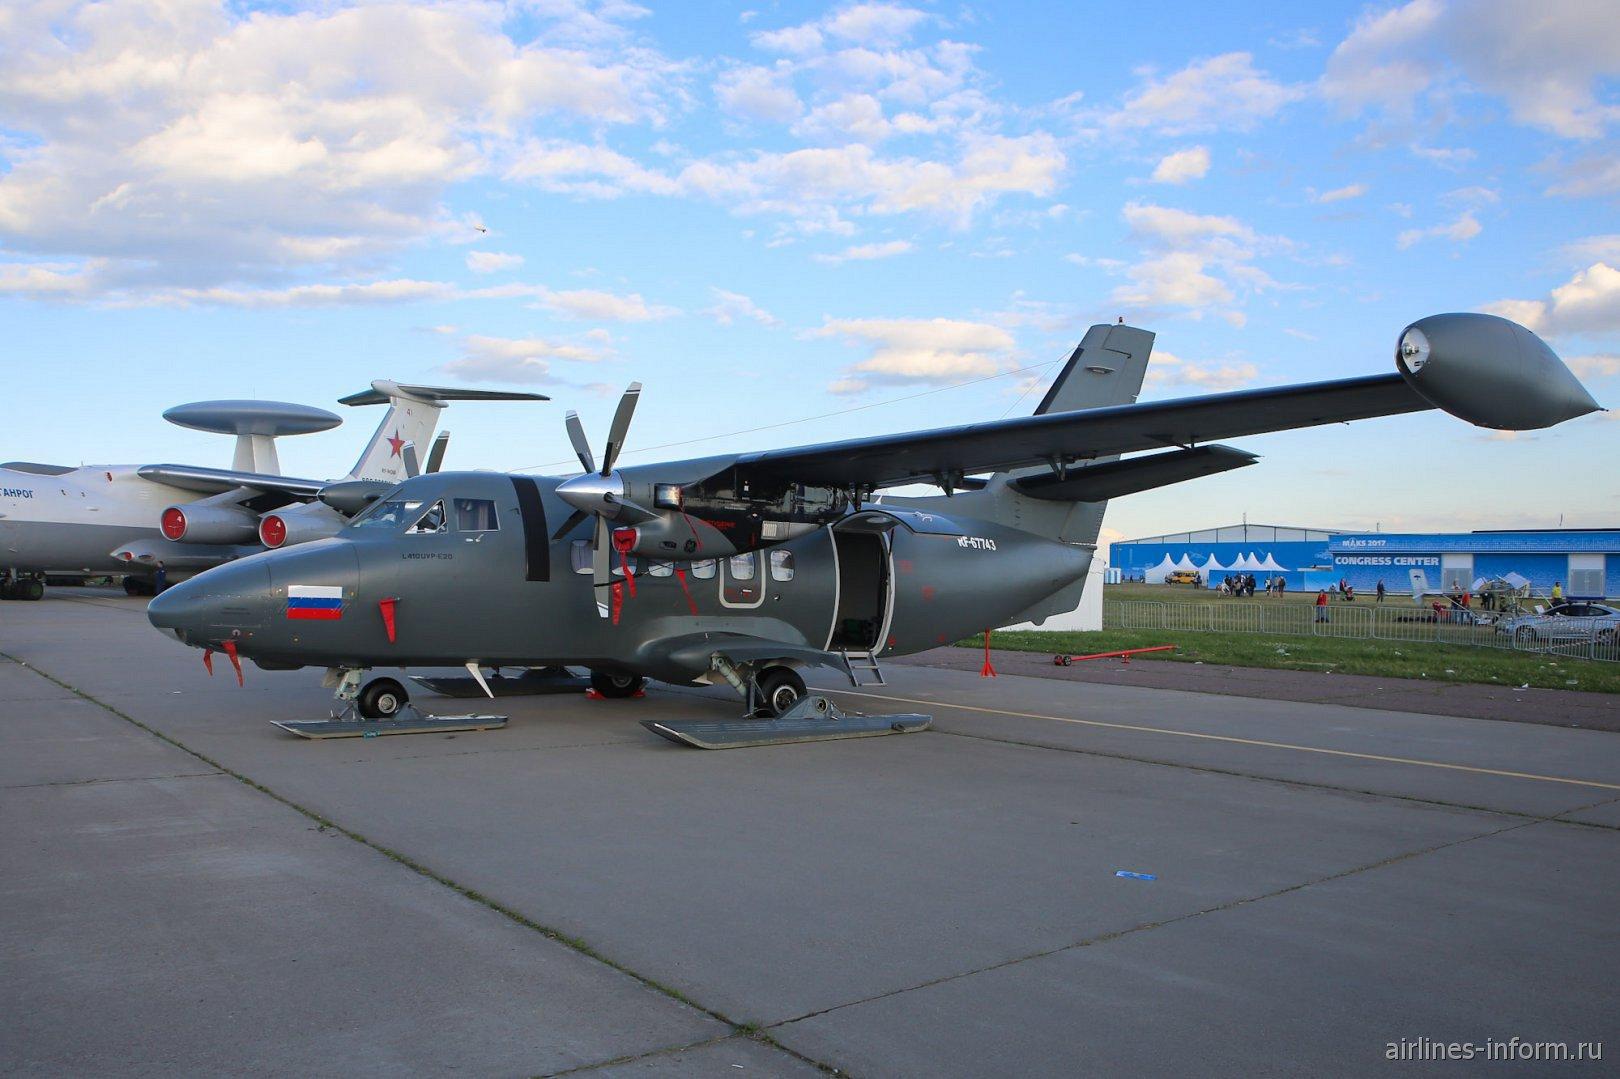 Самолет L-410 ВВС России на авиасалоне МАКС-2017